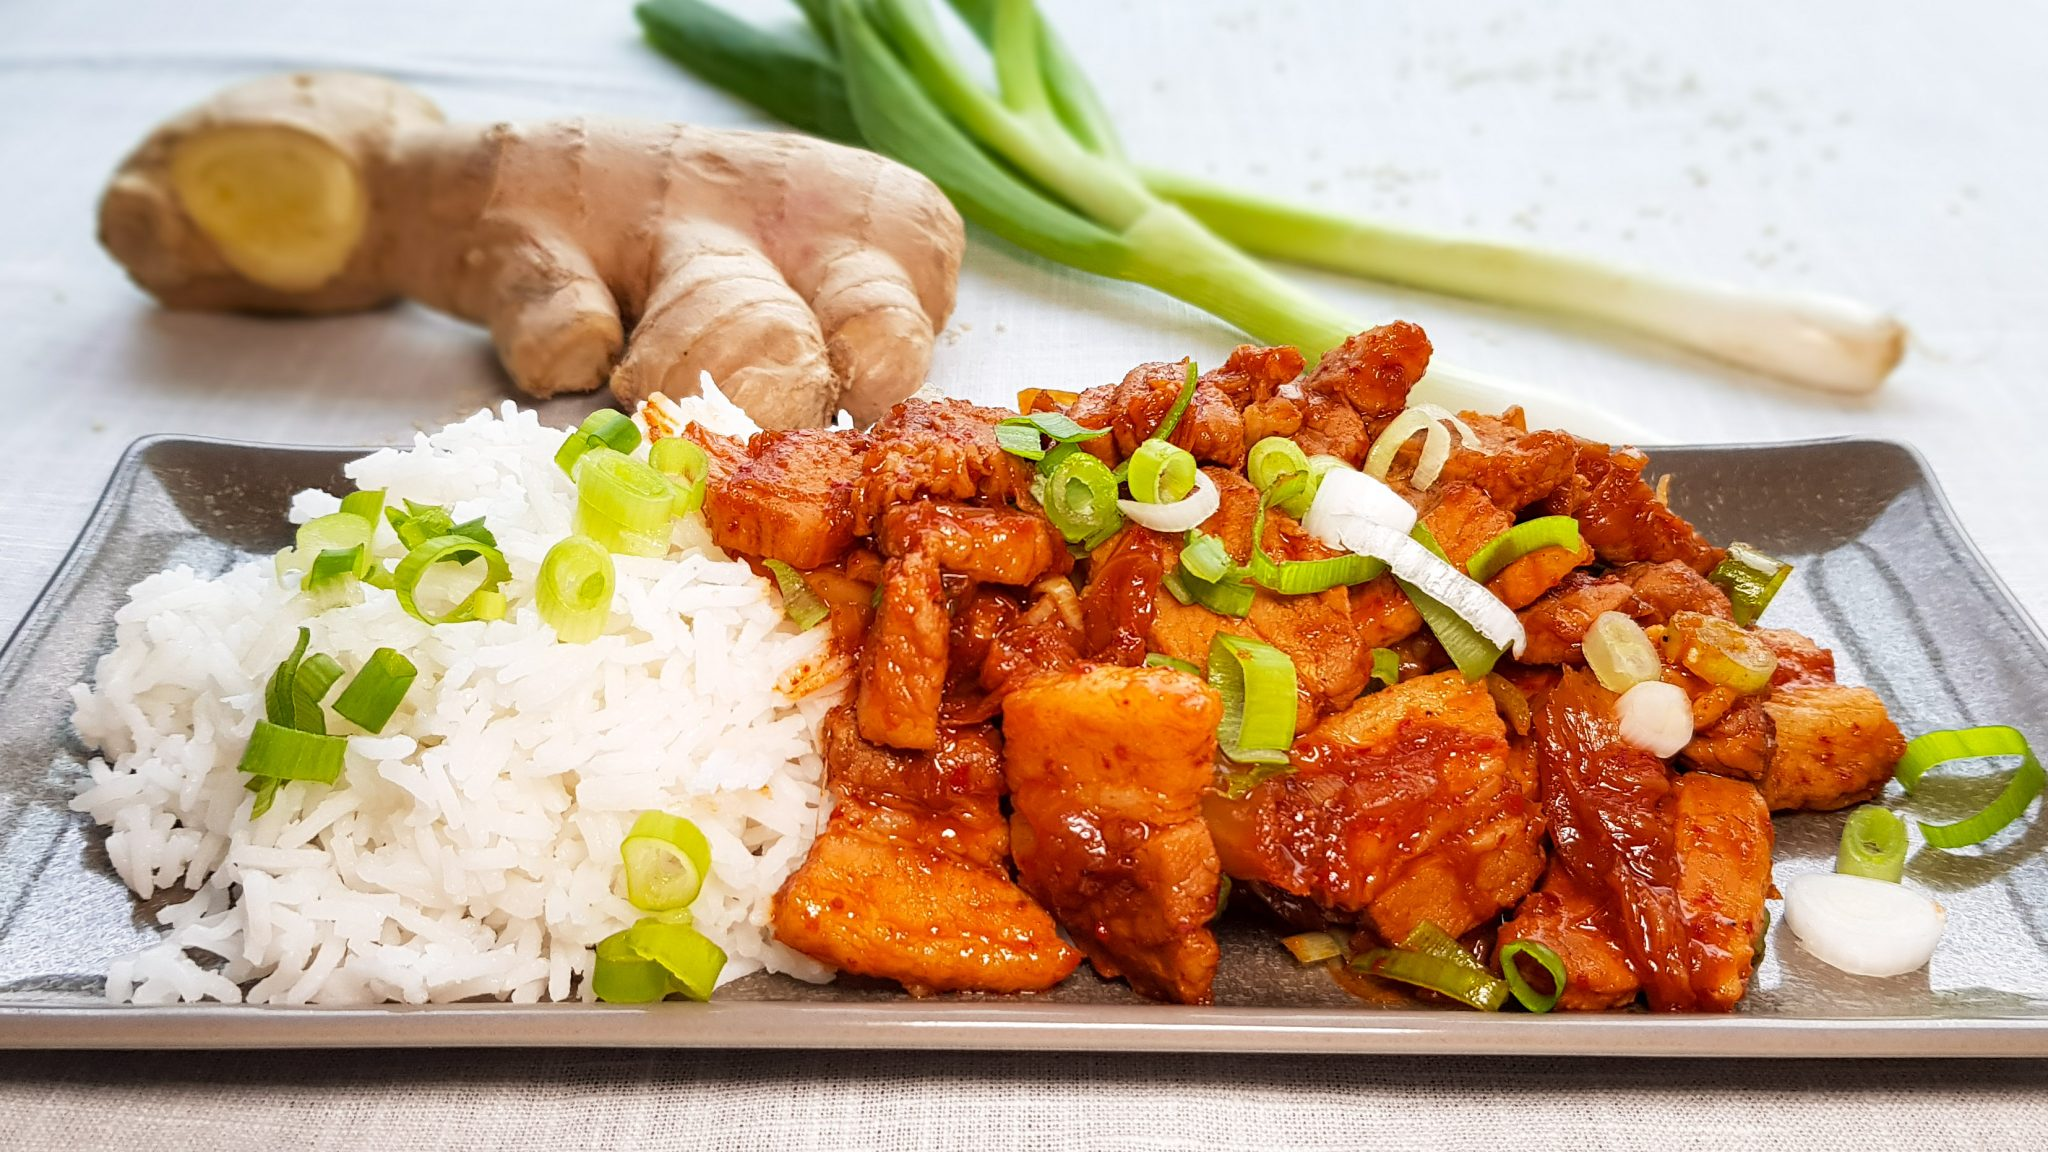 Snelle Kimchistoof met spek (Kimchi Jjigae)